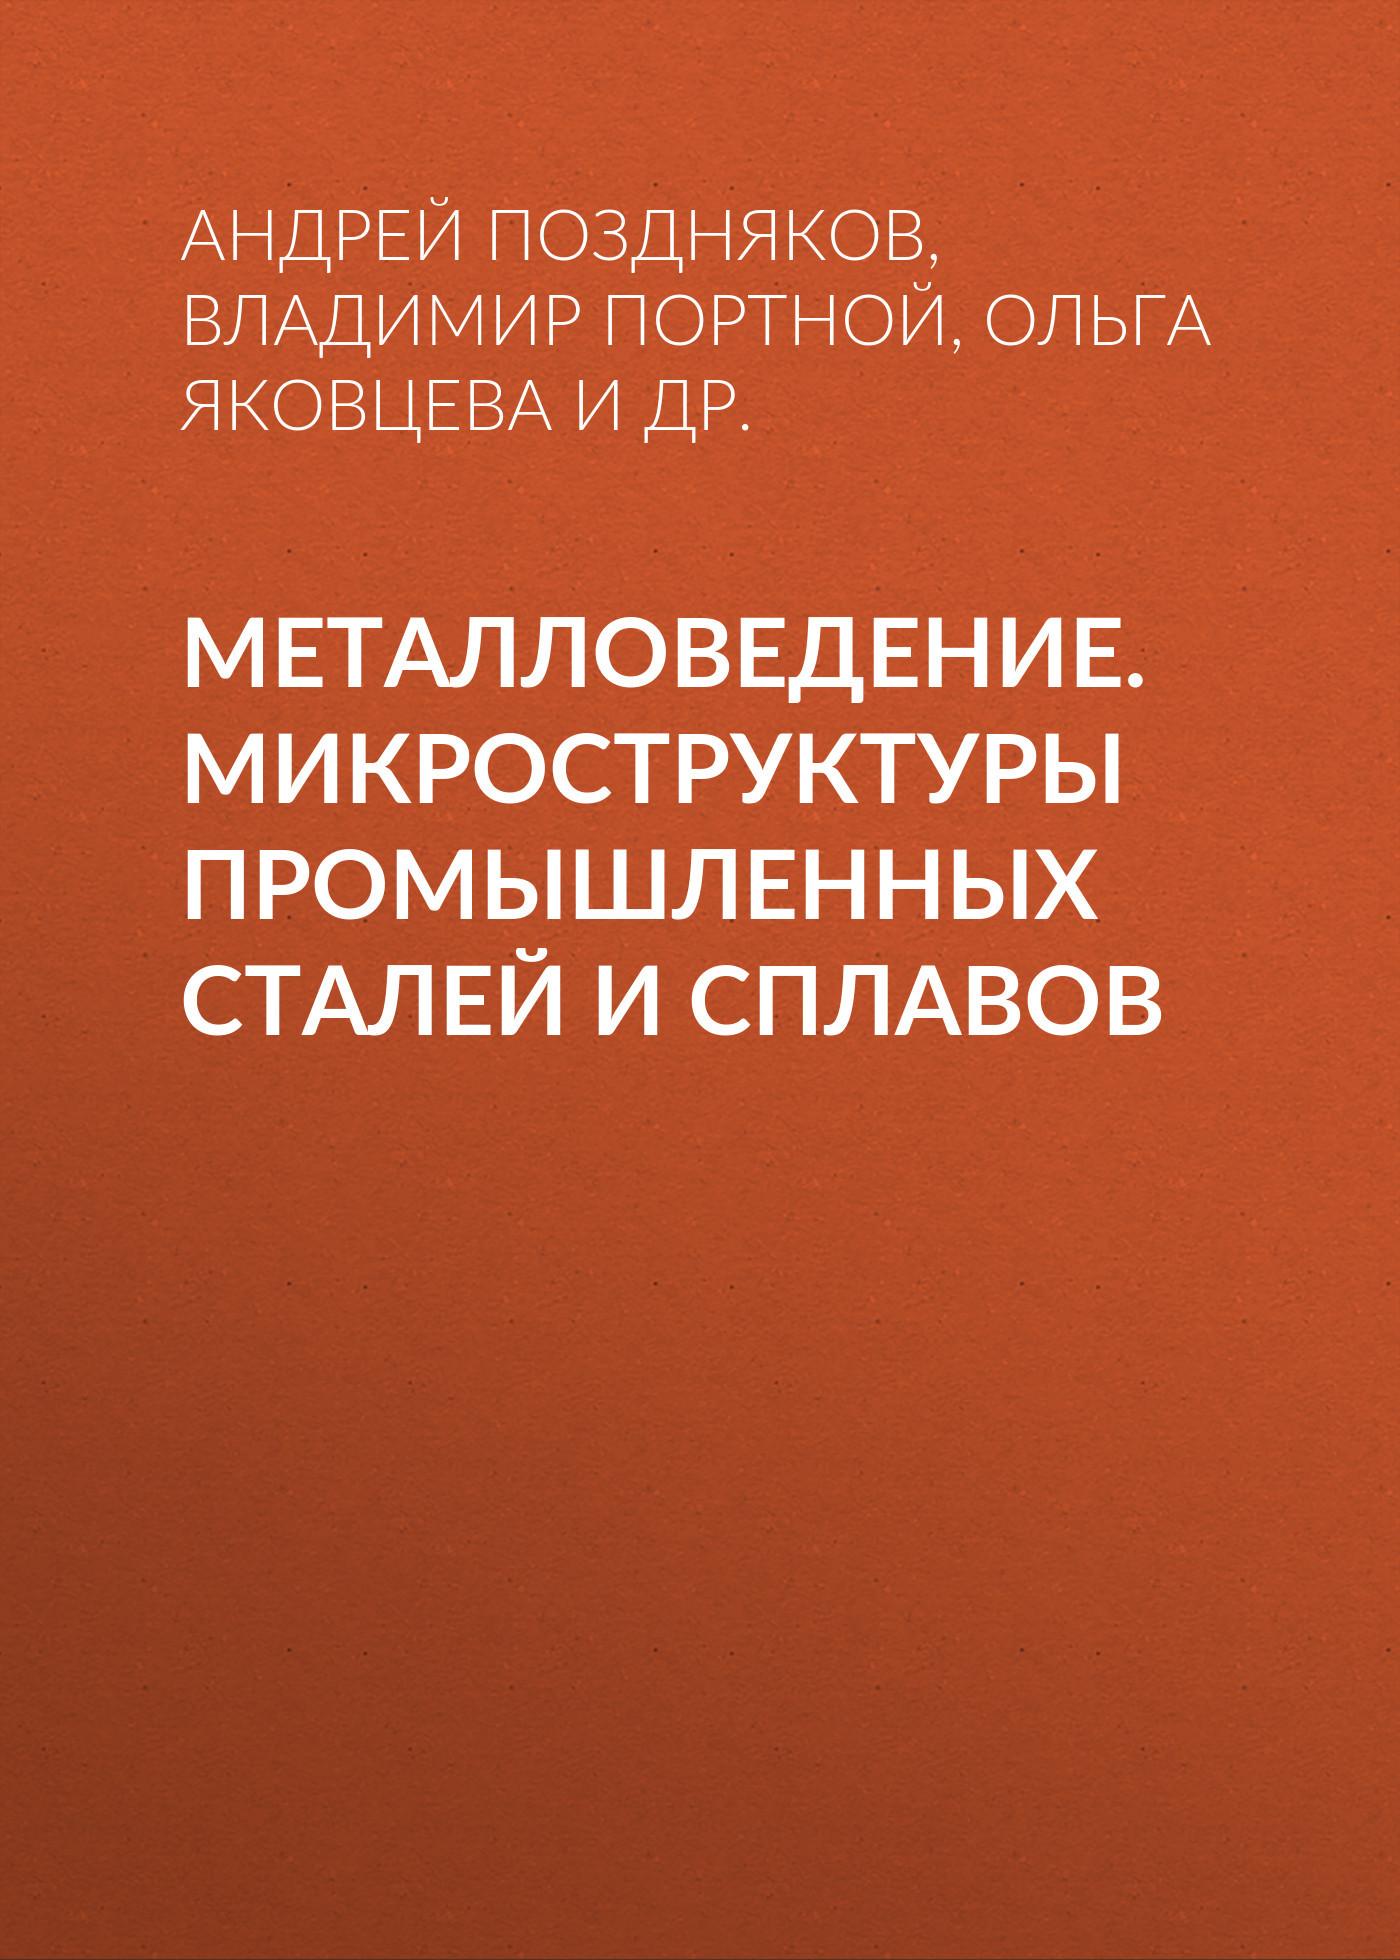 Ольга Яковцева бесплатно